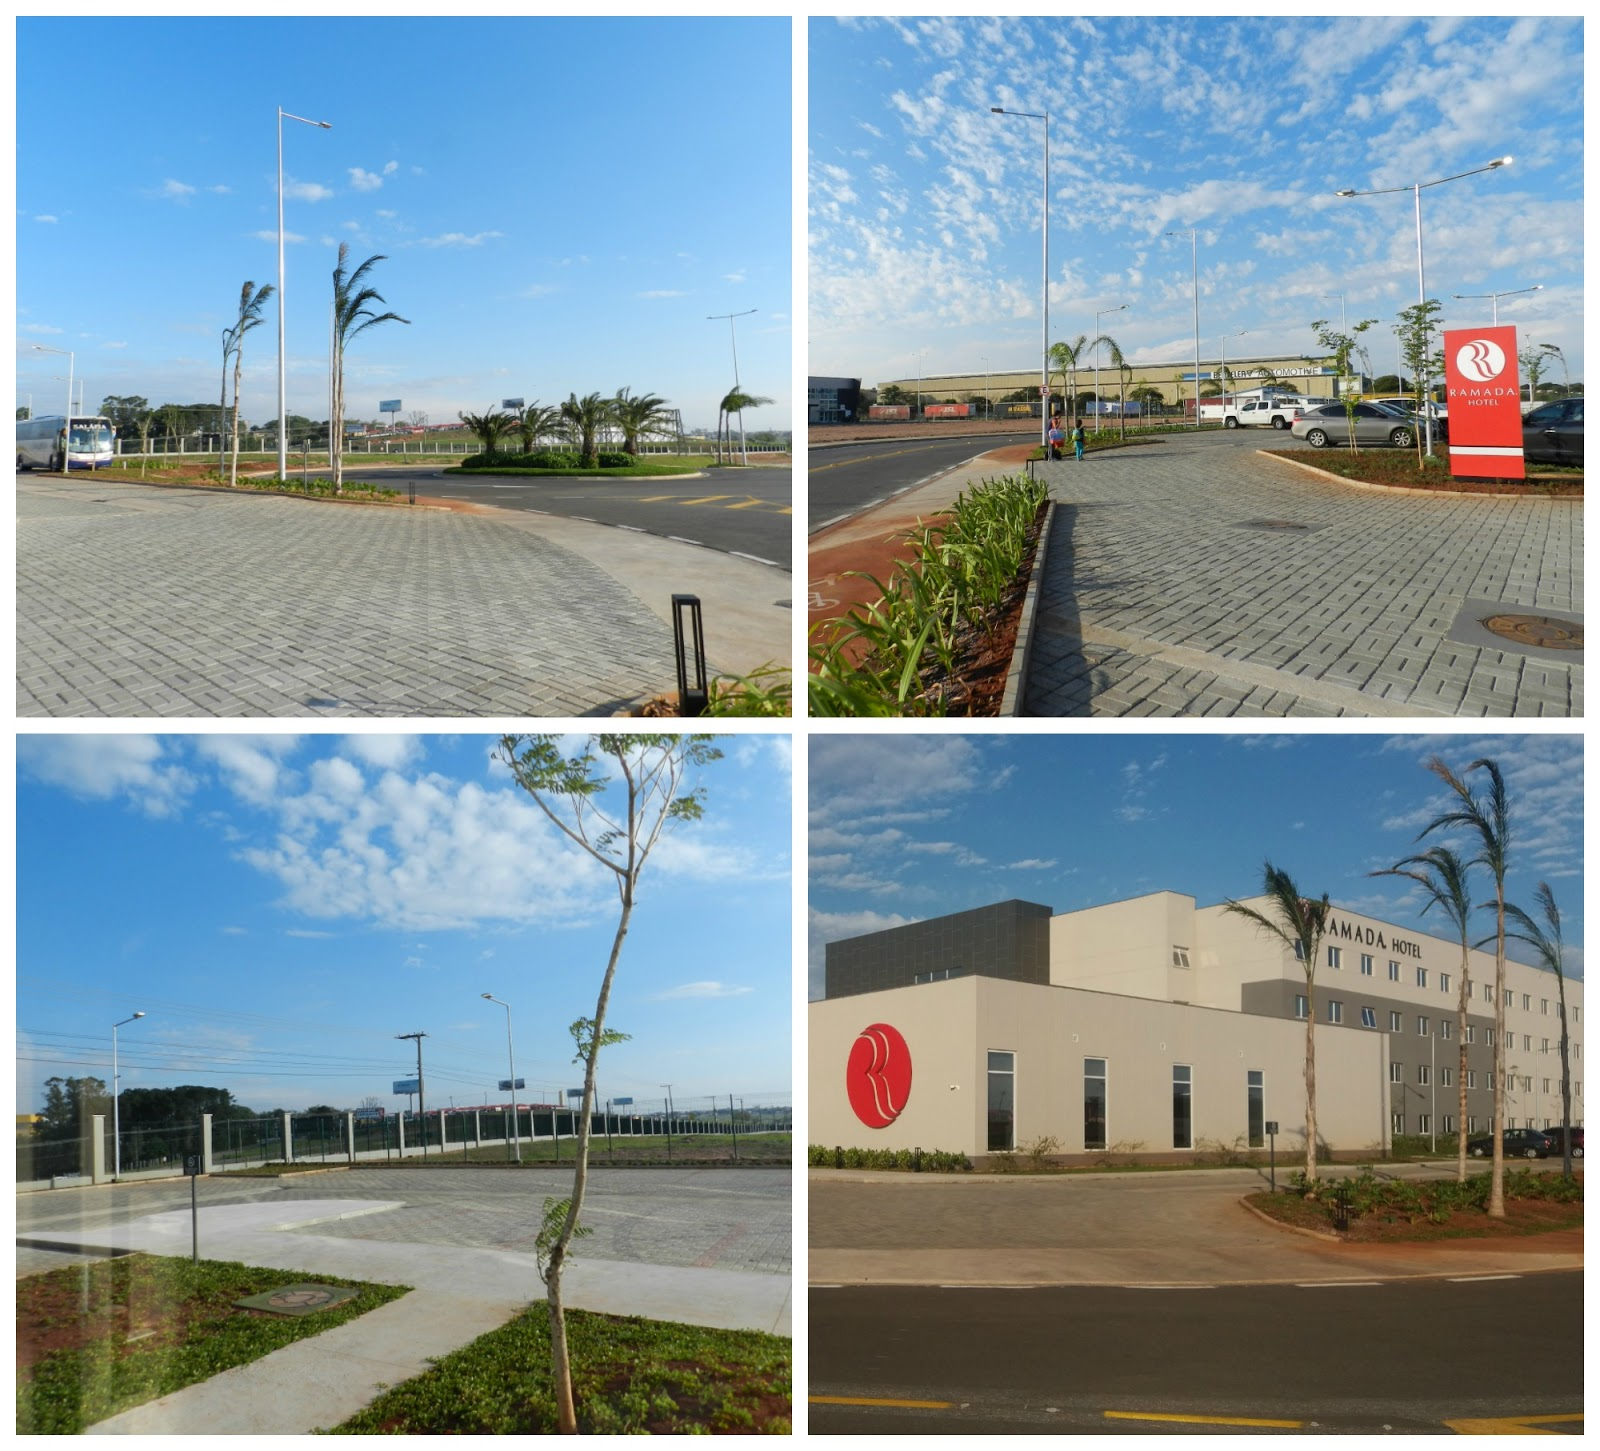 Aeroporto Viracopos Fica Onde : Tá indo pra onde como é se hospedar no ramada hotel